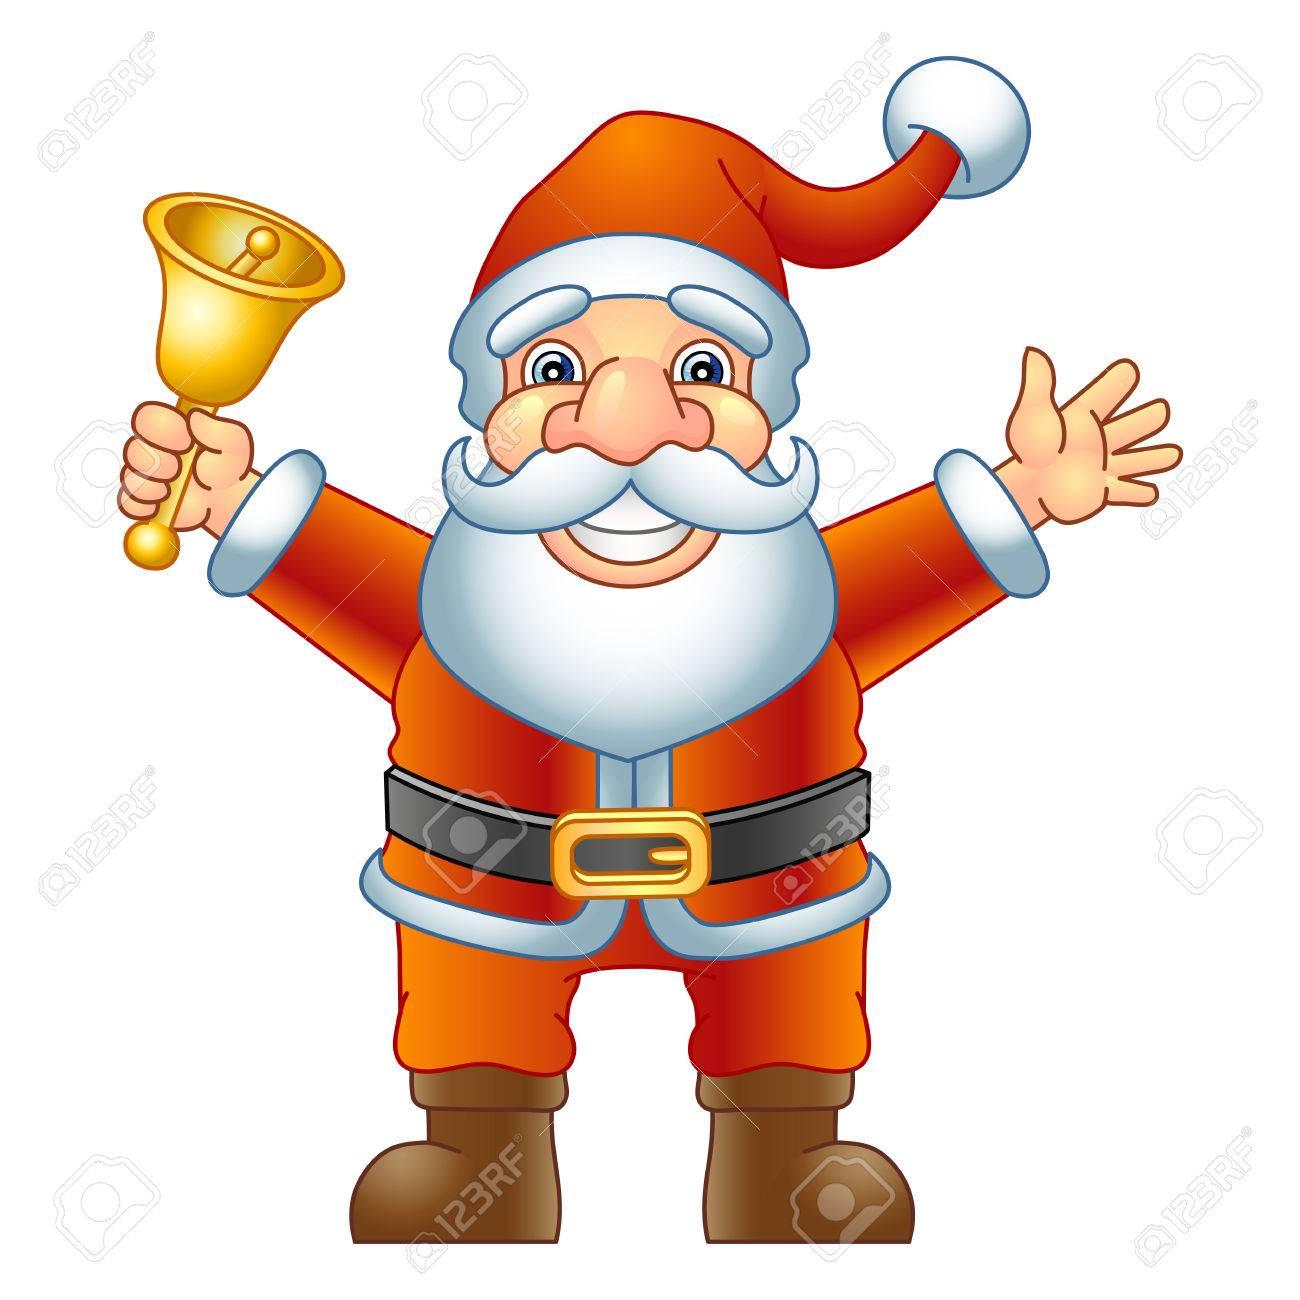 Merry Christmas, Ho-Ho-Ho  Santa Claus with a handbell  Vector illustration Stock Vector - 24908077